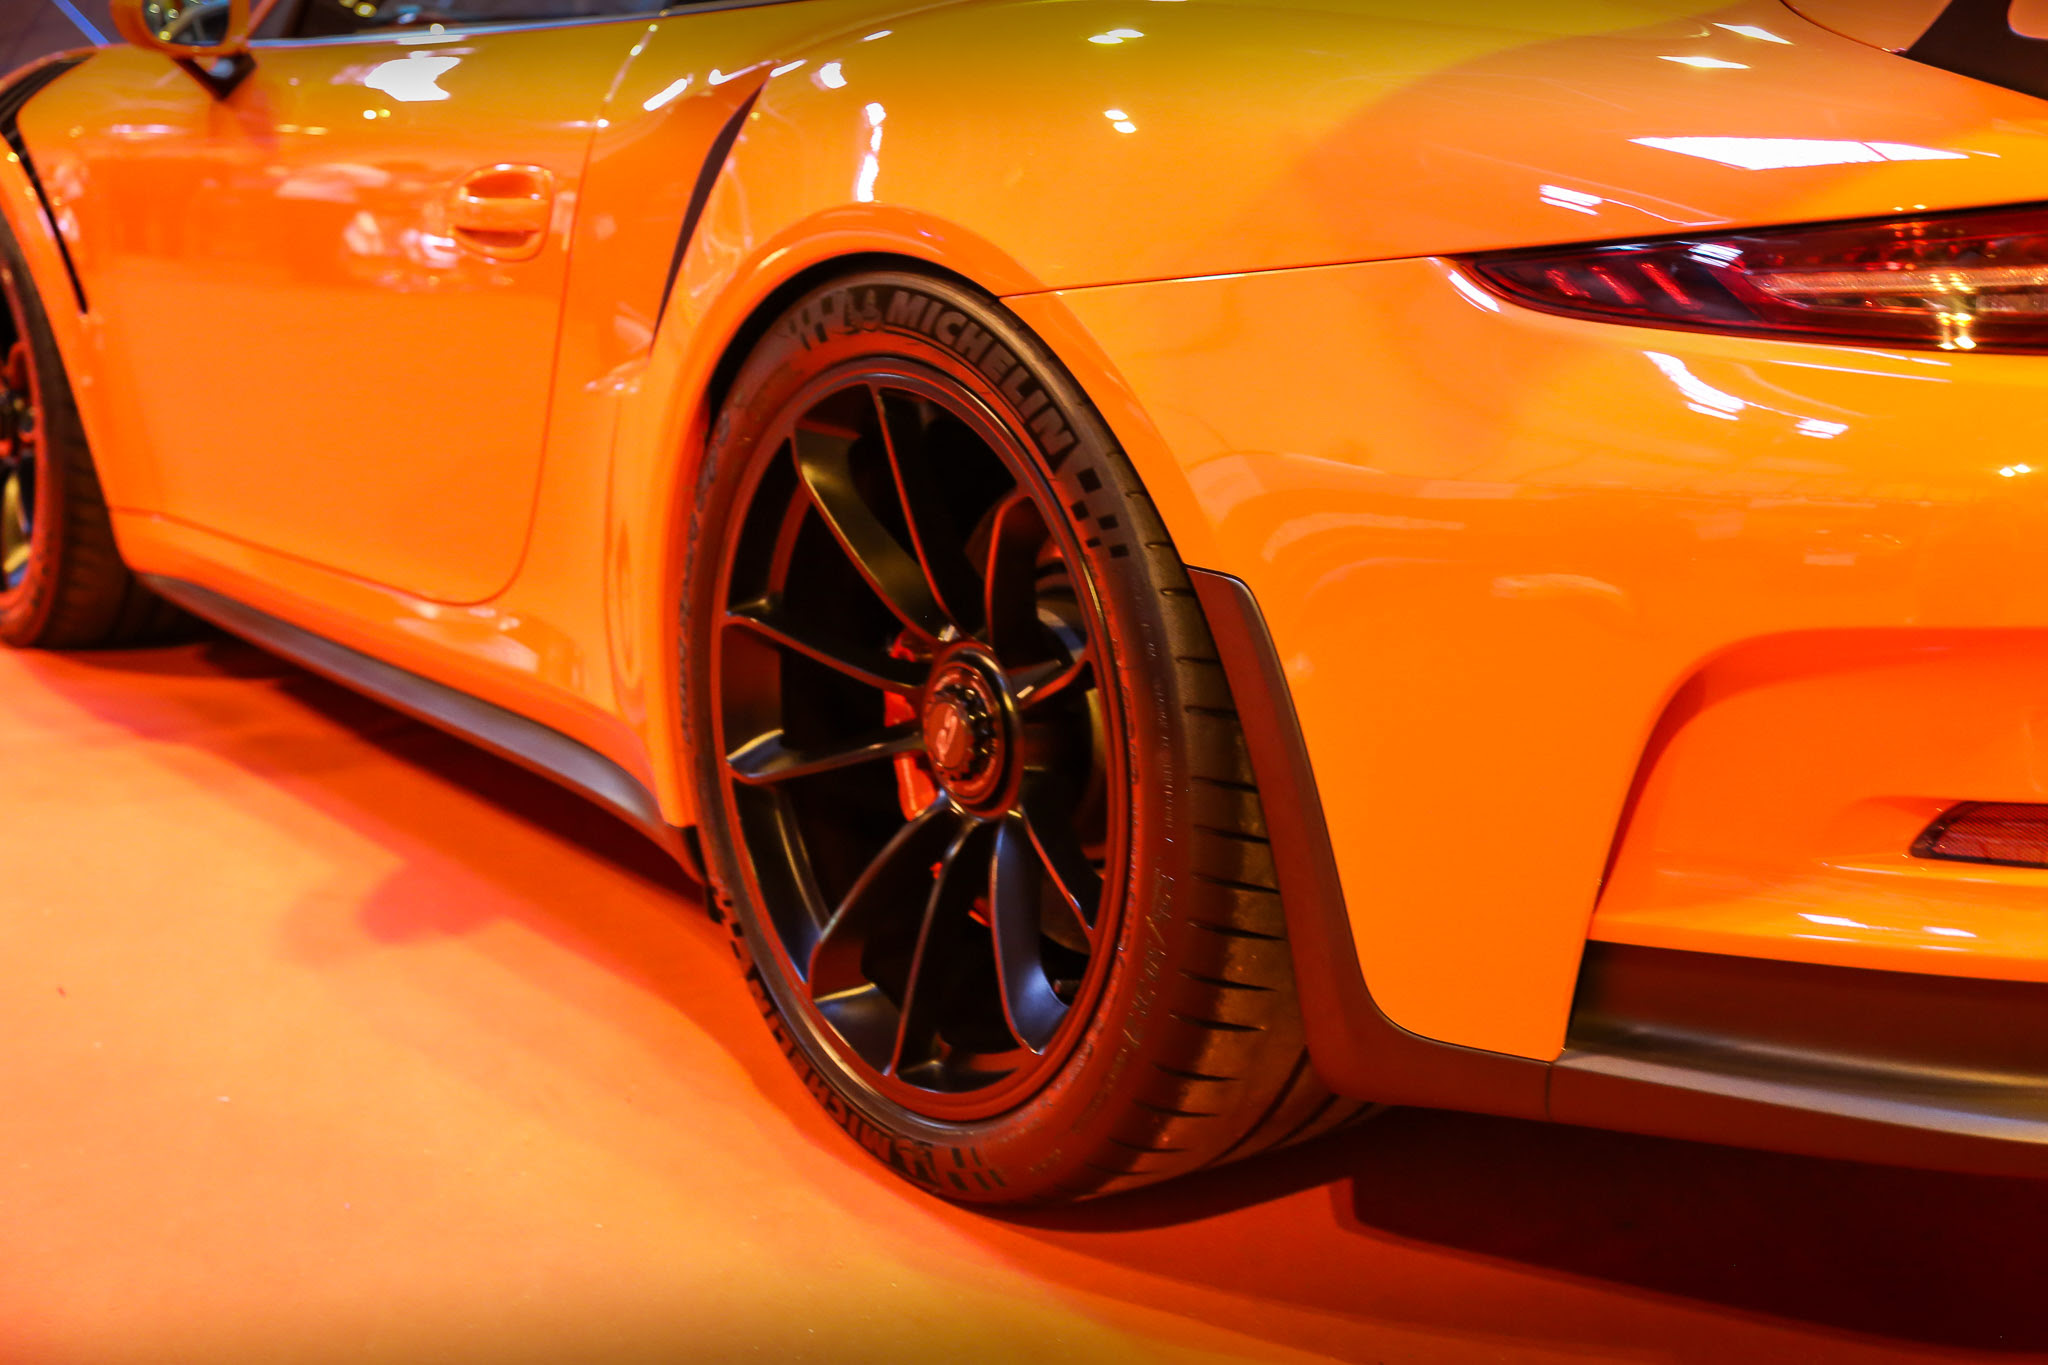 Porsche 911 Gt3 Rs Price List Philippines Reviews Specs U0026 2018 Promos Zigwheels New Car Motors